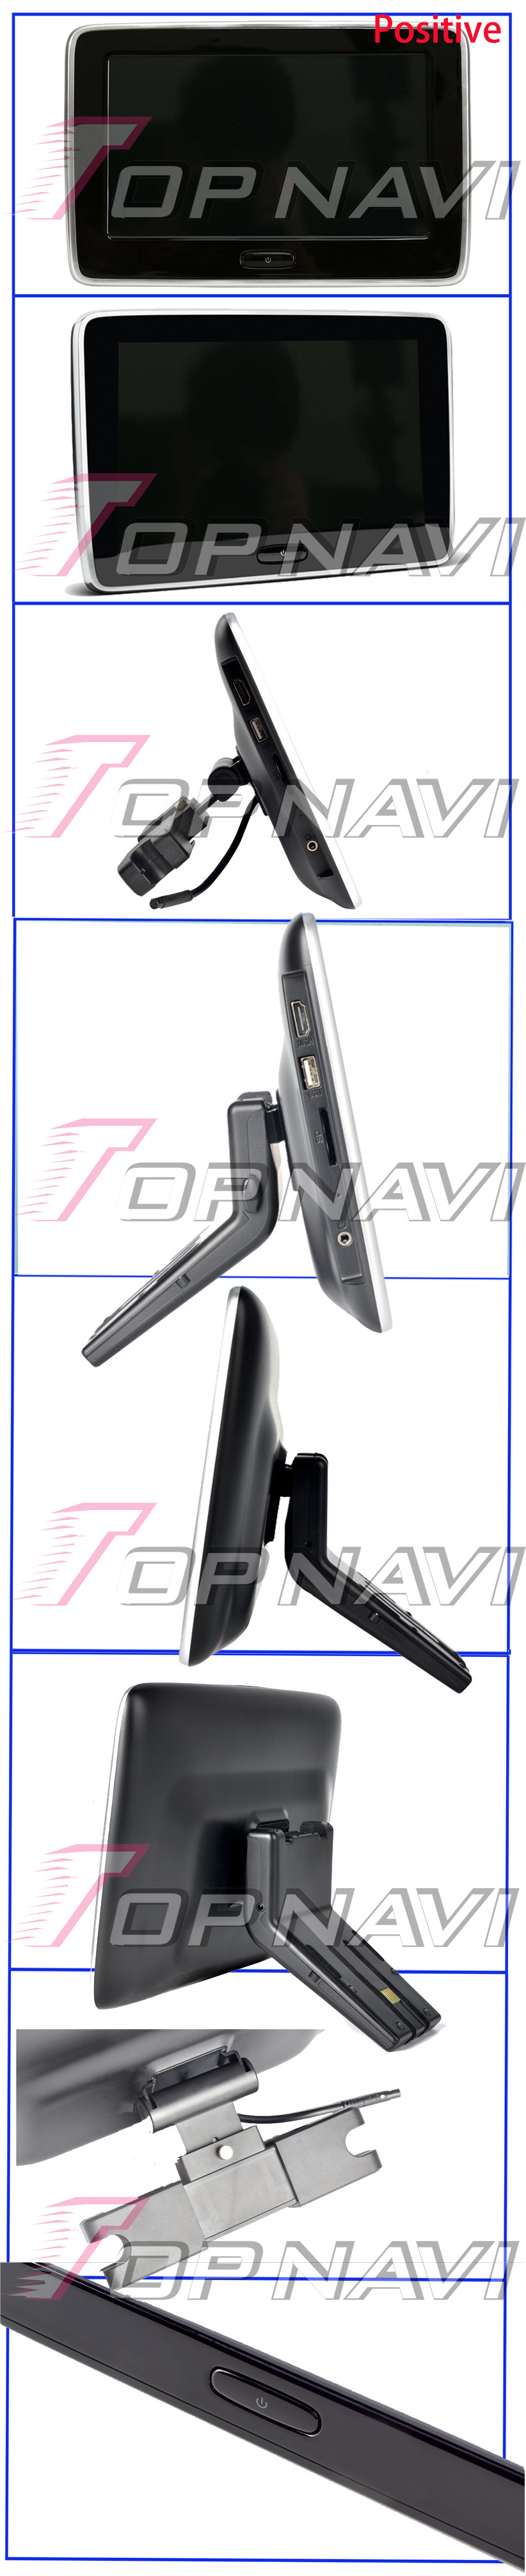 Car Headrest MP4 Monitor Multi media Player